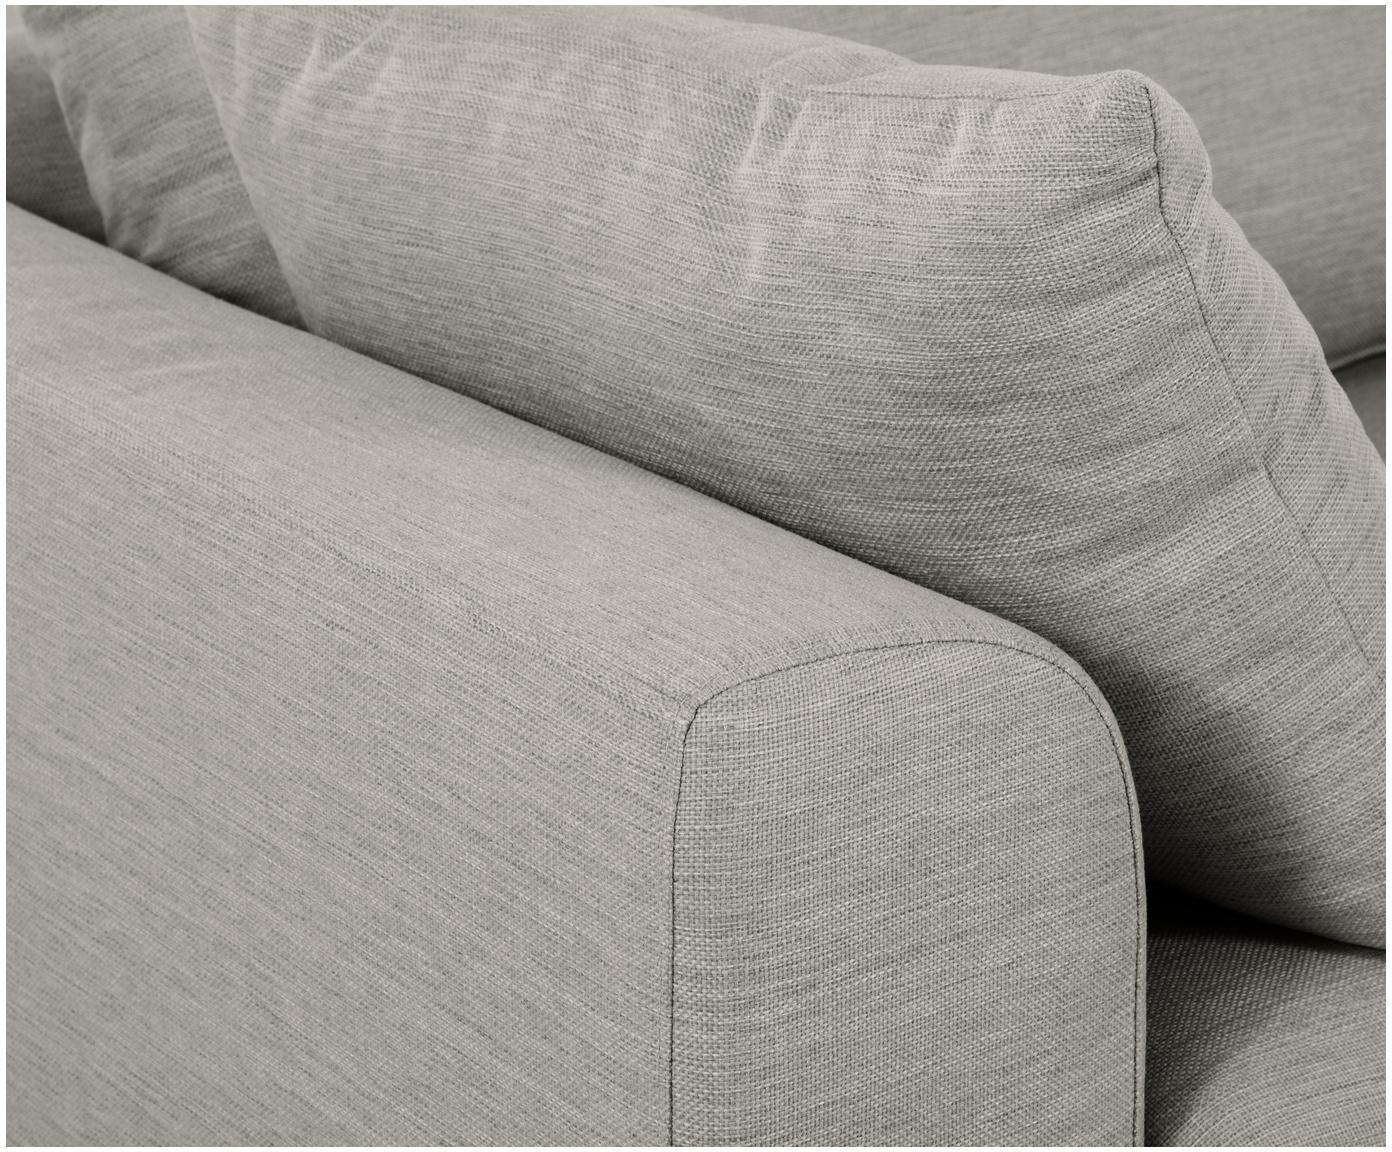 Sofa Zach (2-Sitzer), Bezug: 100% Polypropylen, Webstoff Zach, B 191 x T 90 cm